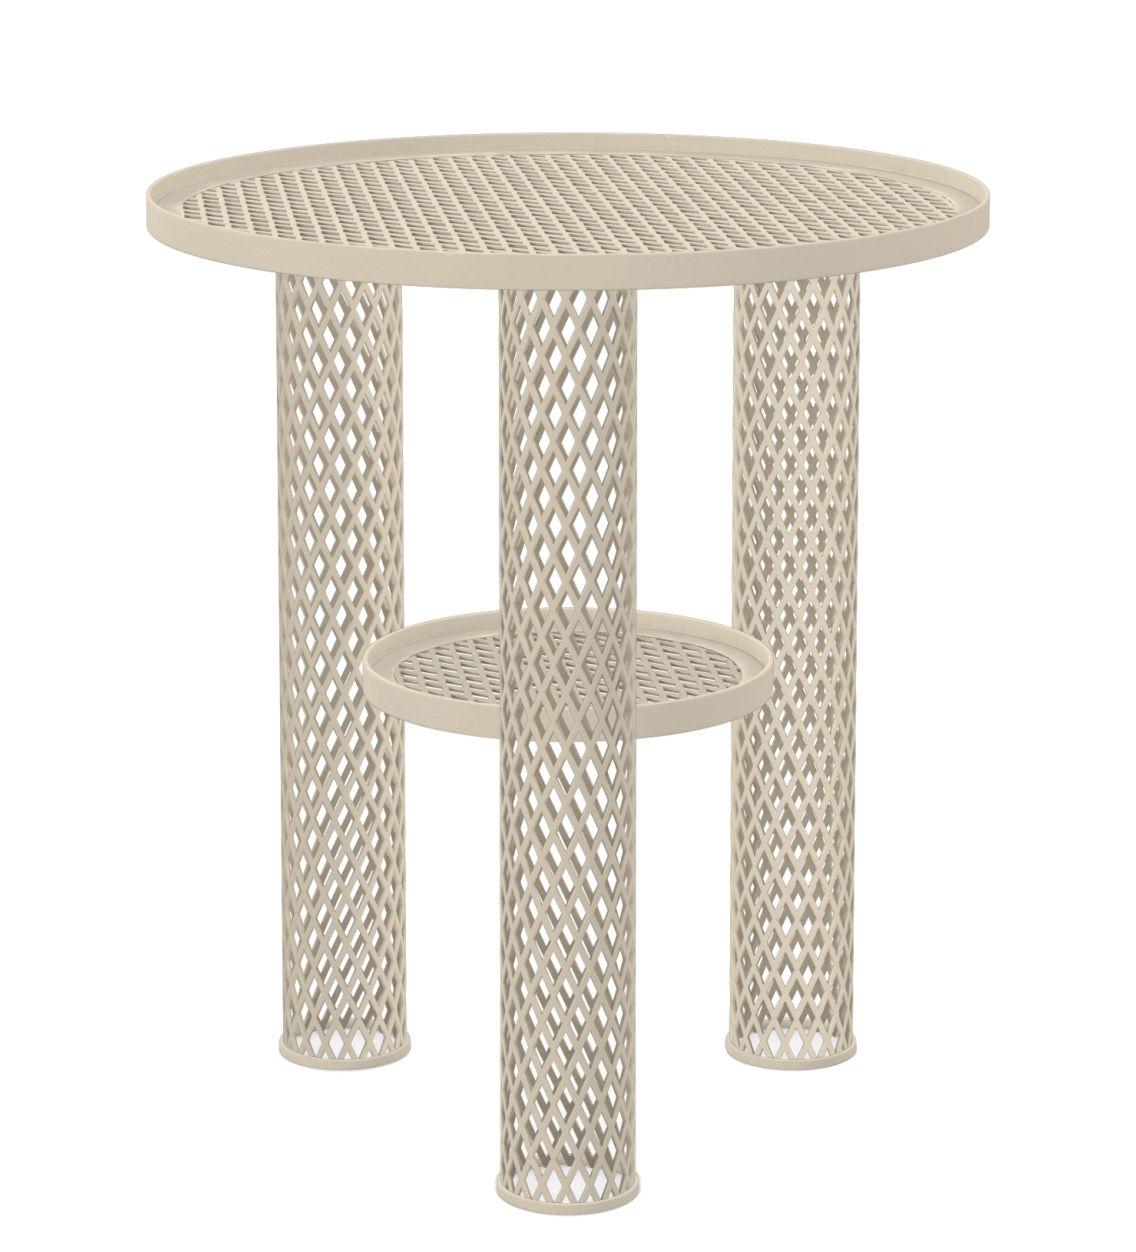 Furniture - Coffee Tables - Net Coffee table - Steel mesh / Ø 40 x H 46 cm by Moroso - Blanc - Varnished steel